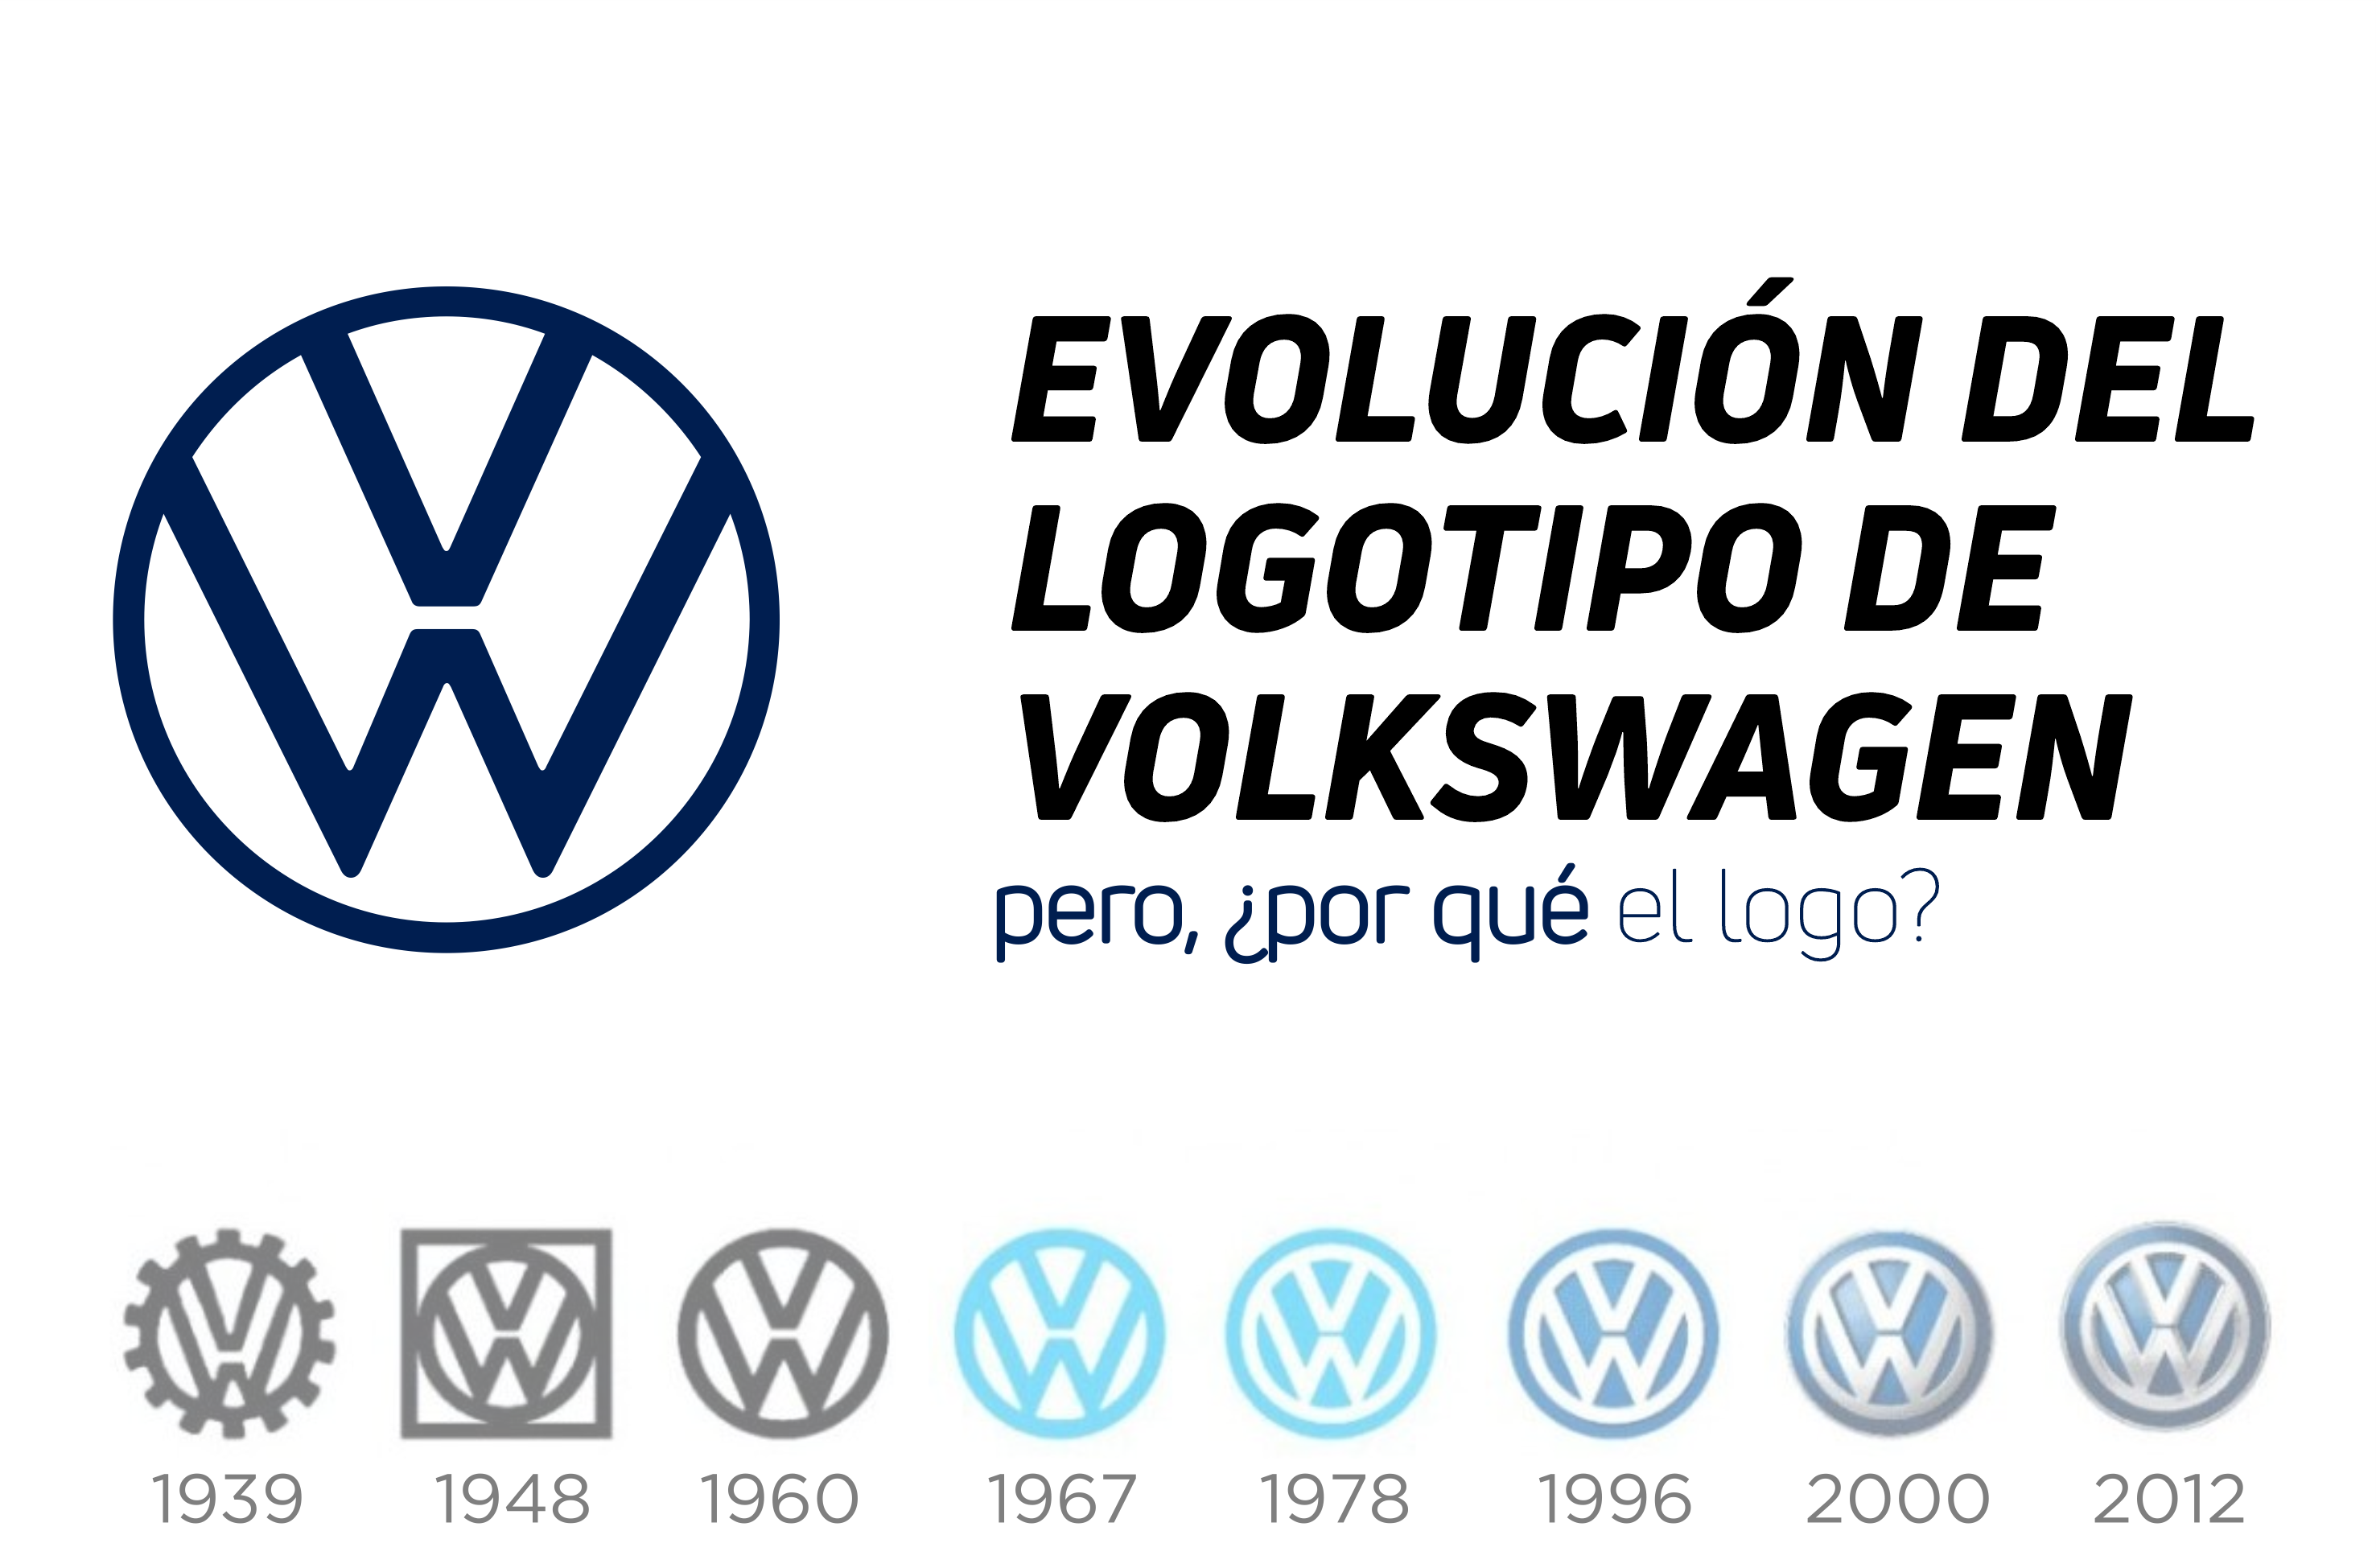 evolucion logo volkswagen rebranding